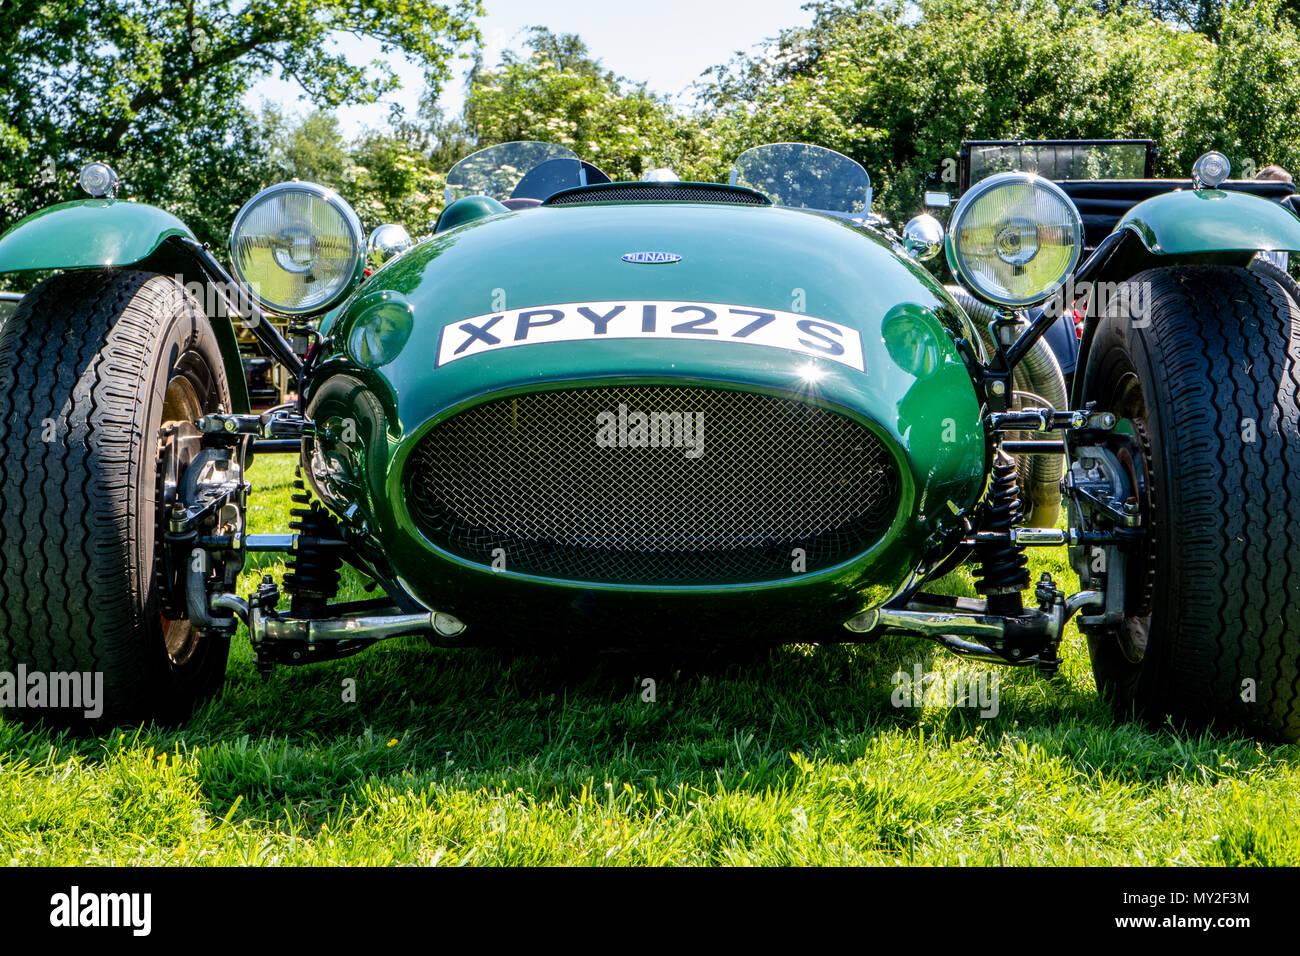 A British Racing Green Ronart Car Taken At A Classic Car Meet In - Classic car meets near me